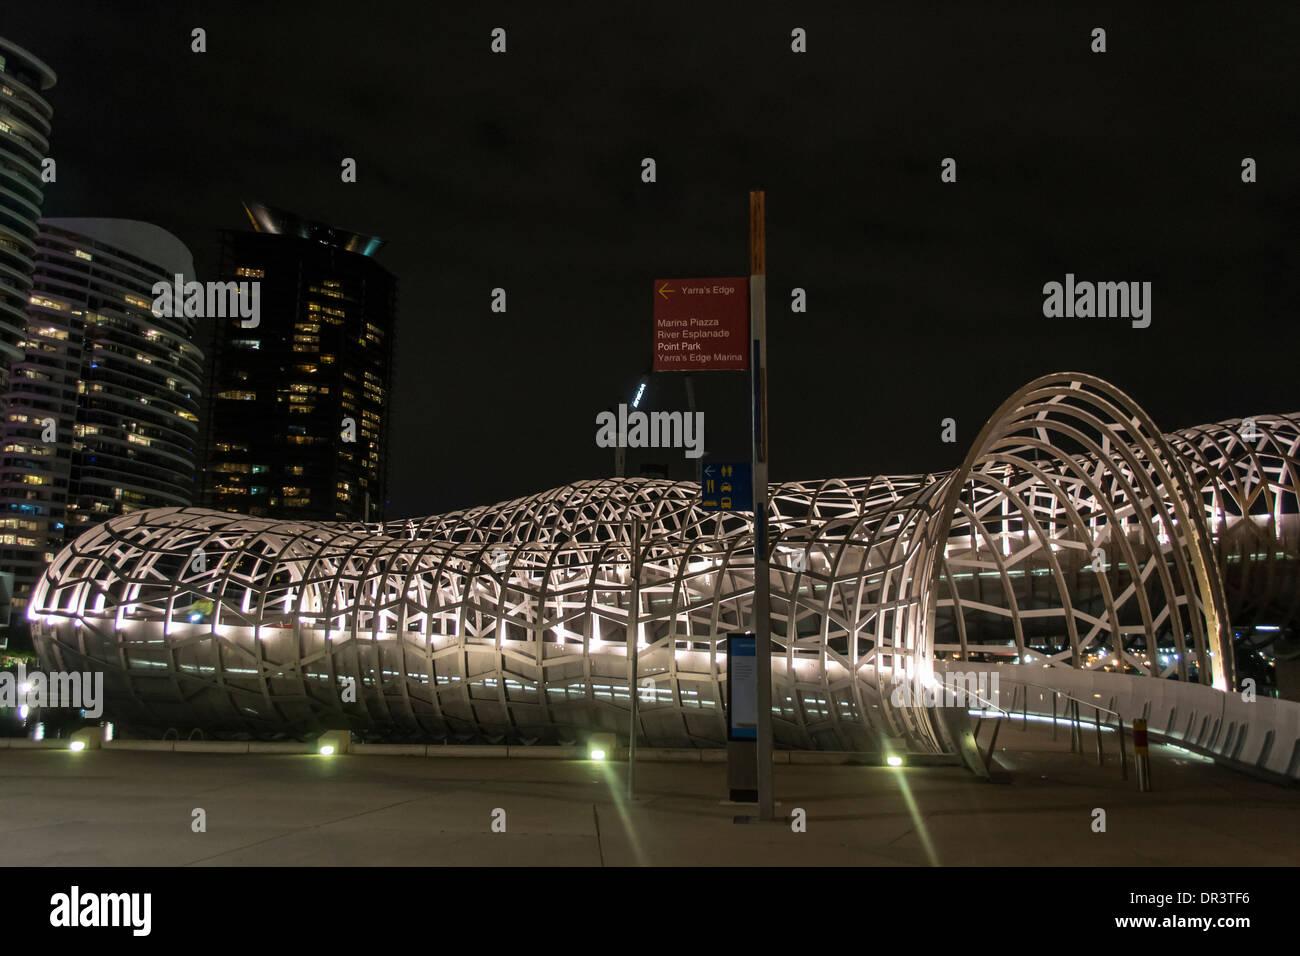 Webb Bridge, Melbourne, Australia - Stock Image